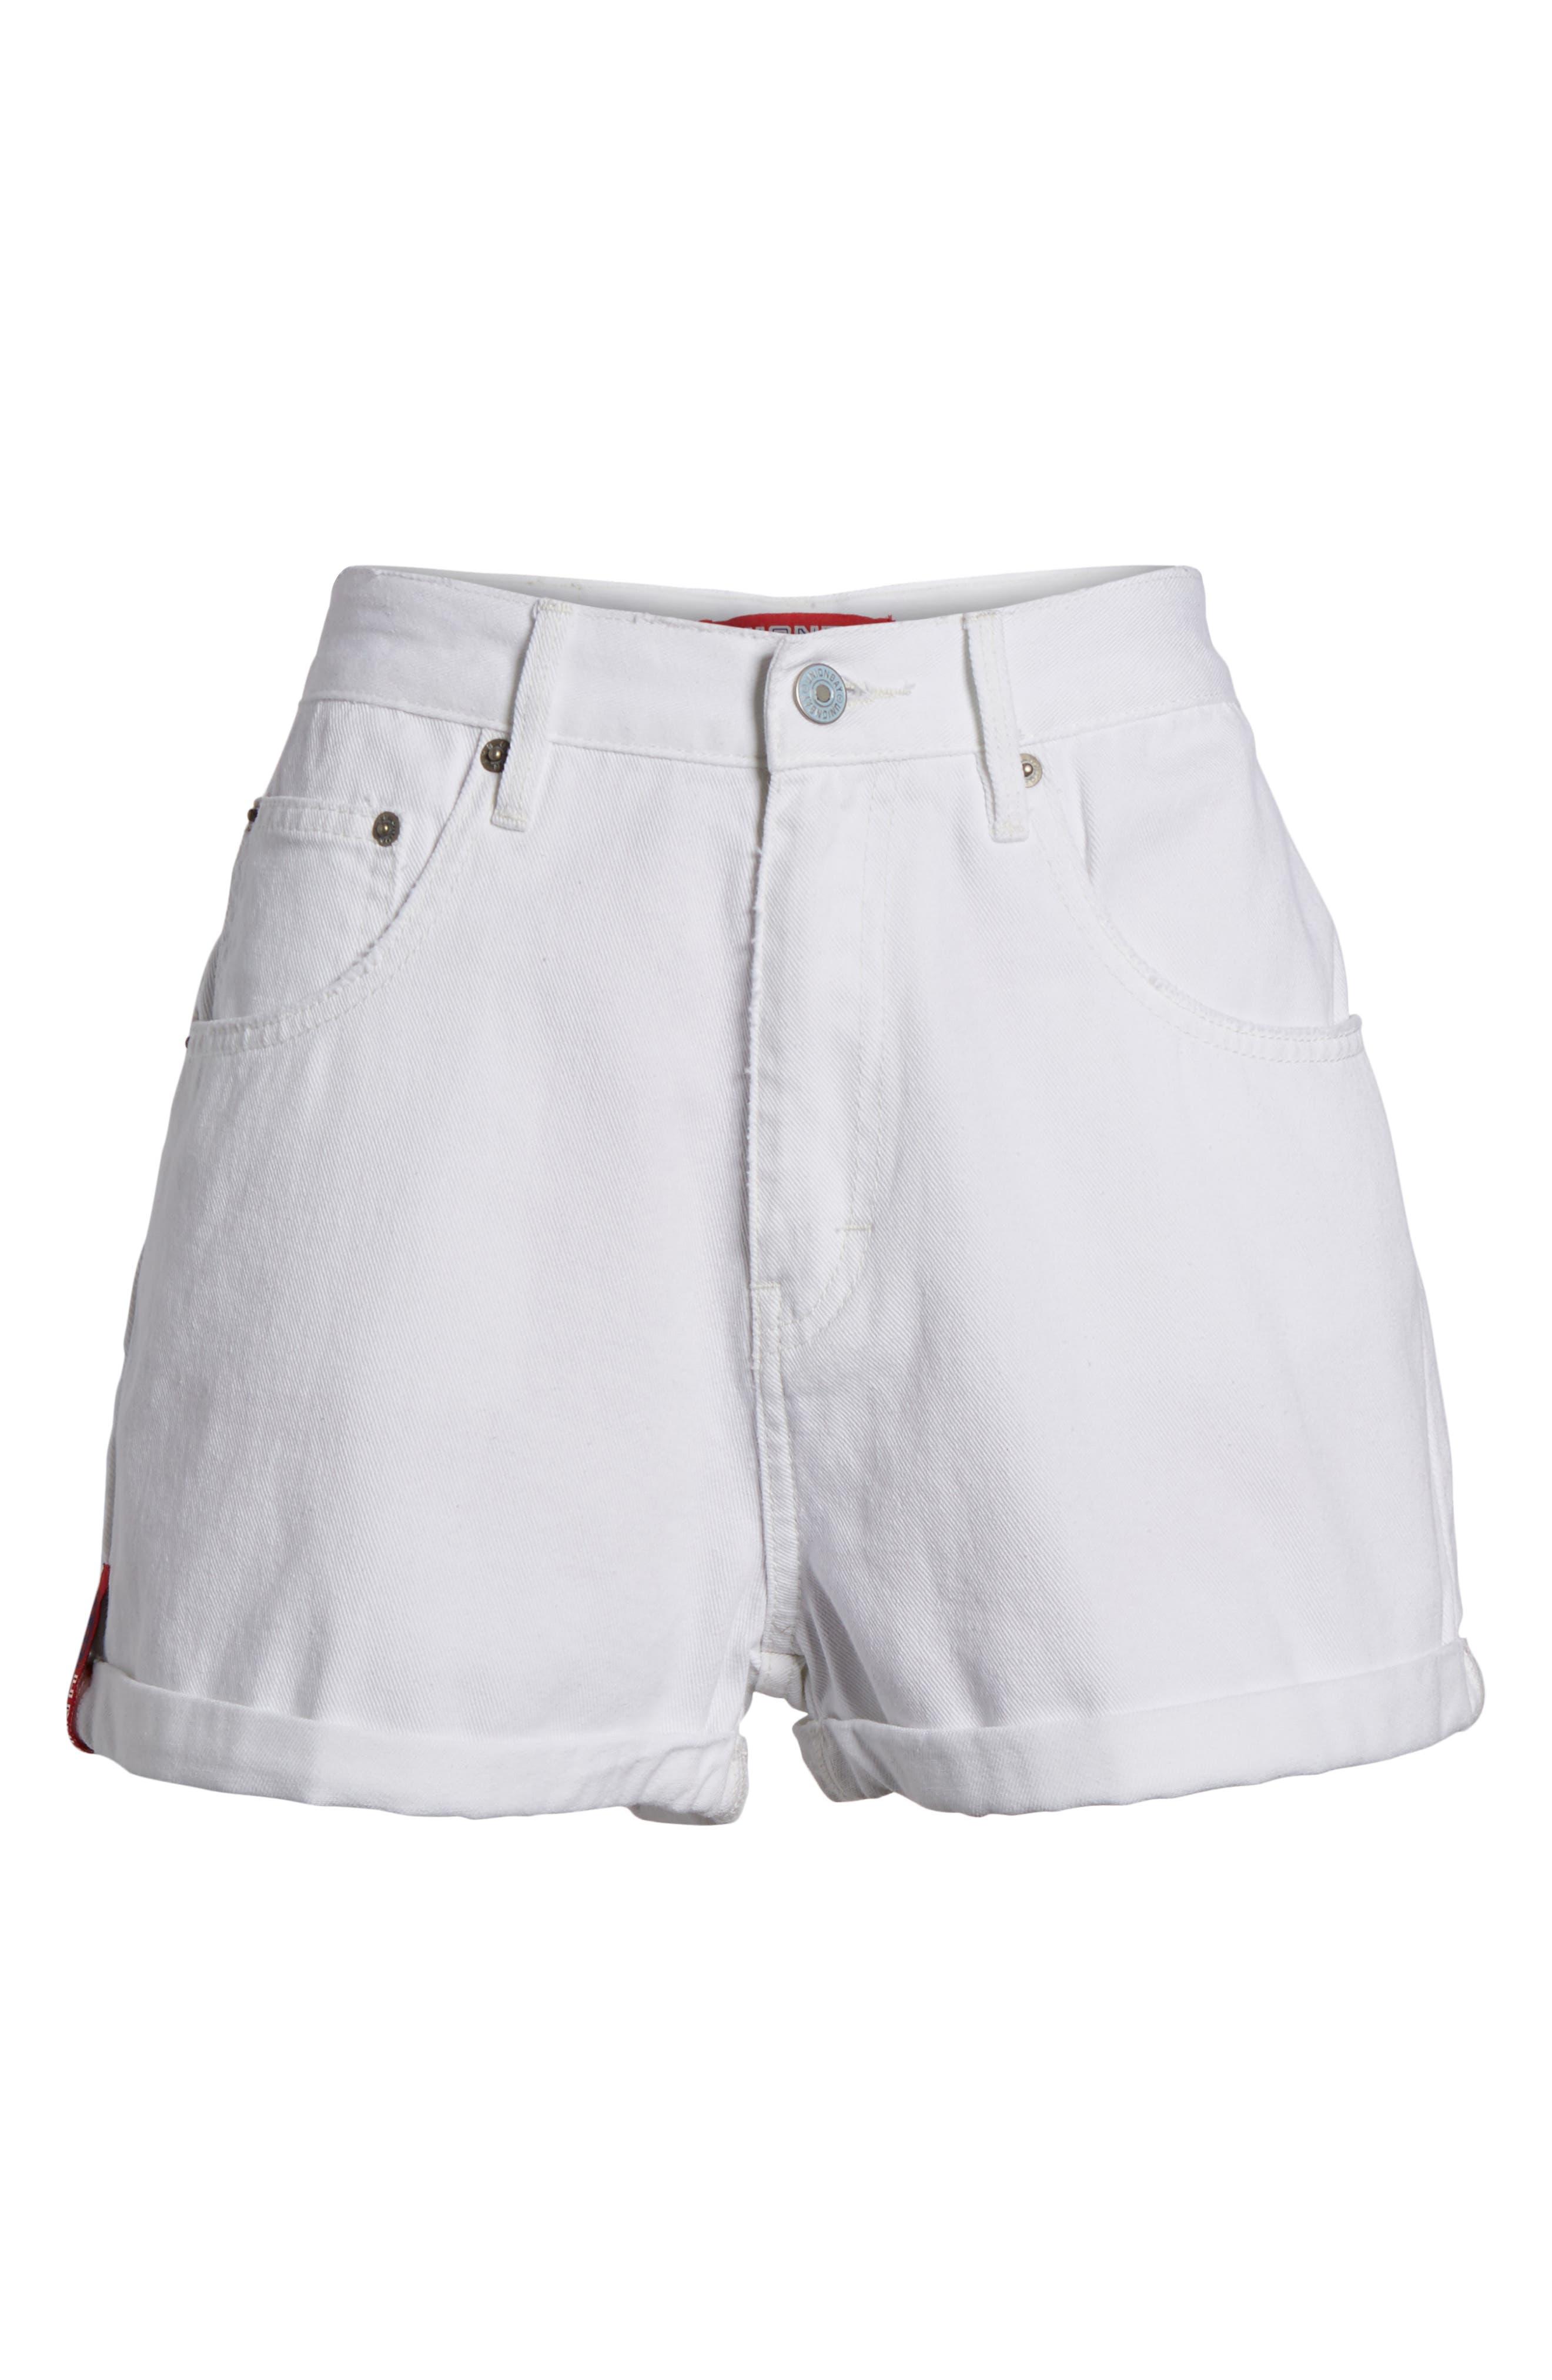 Unionbay UB Tab Denim Shorts,                             Alternate thumbnail 6, color,                             100